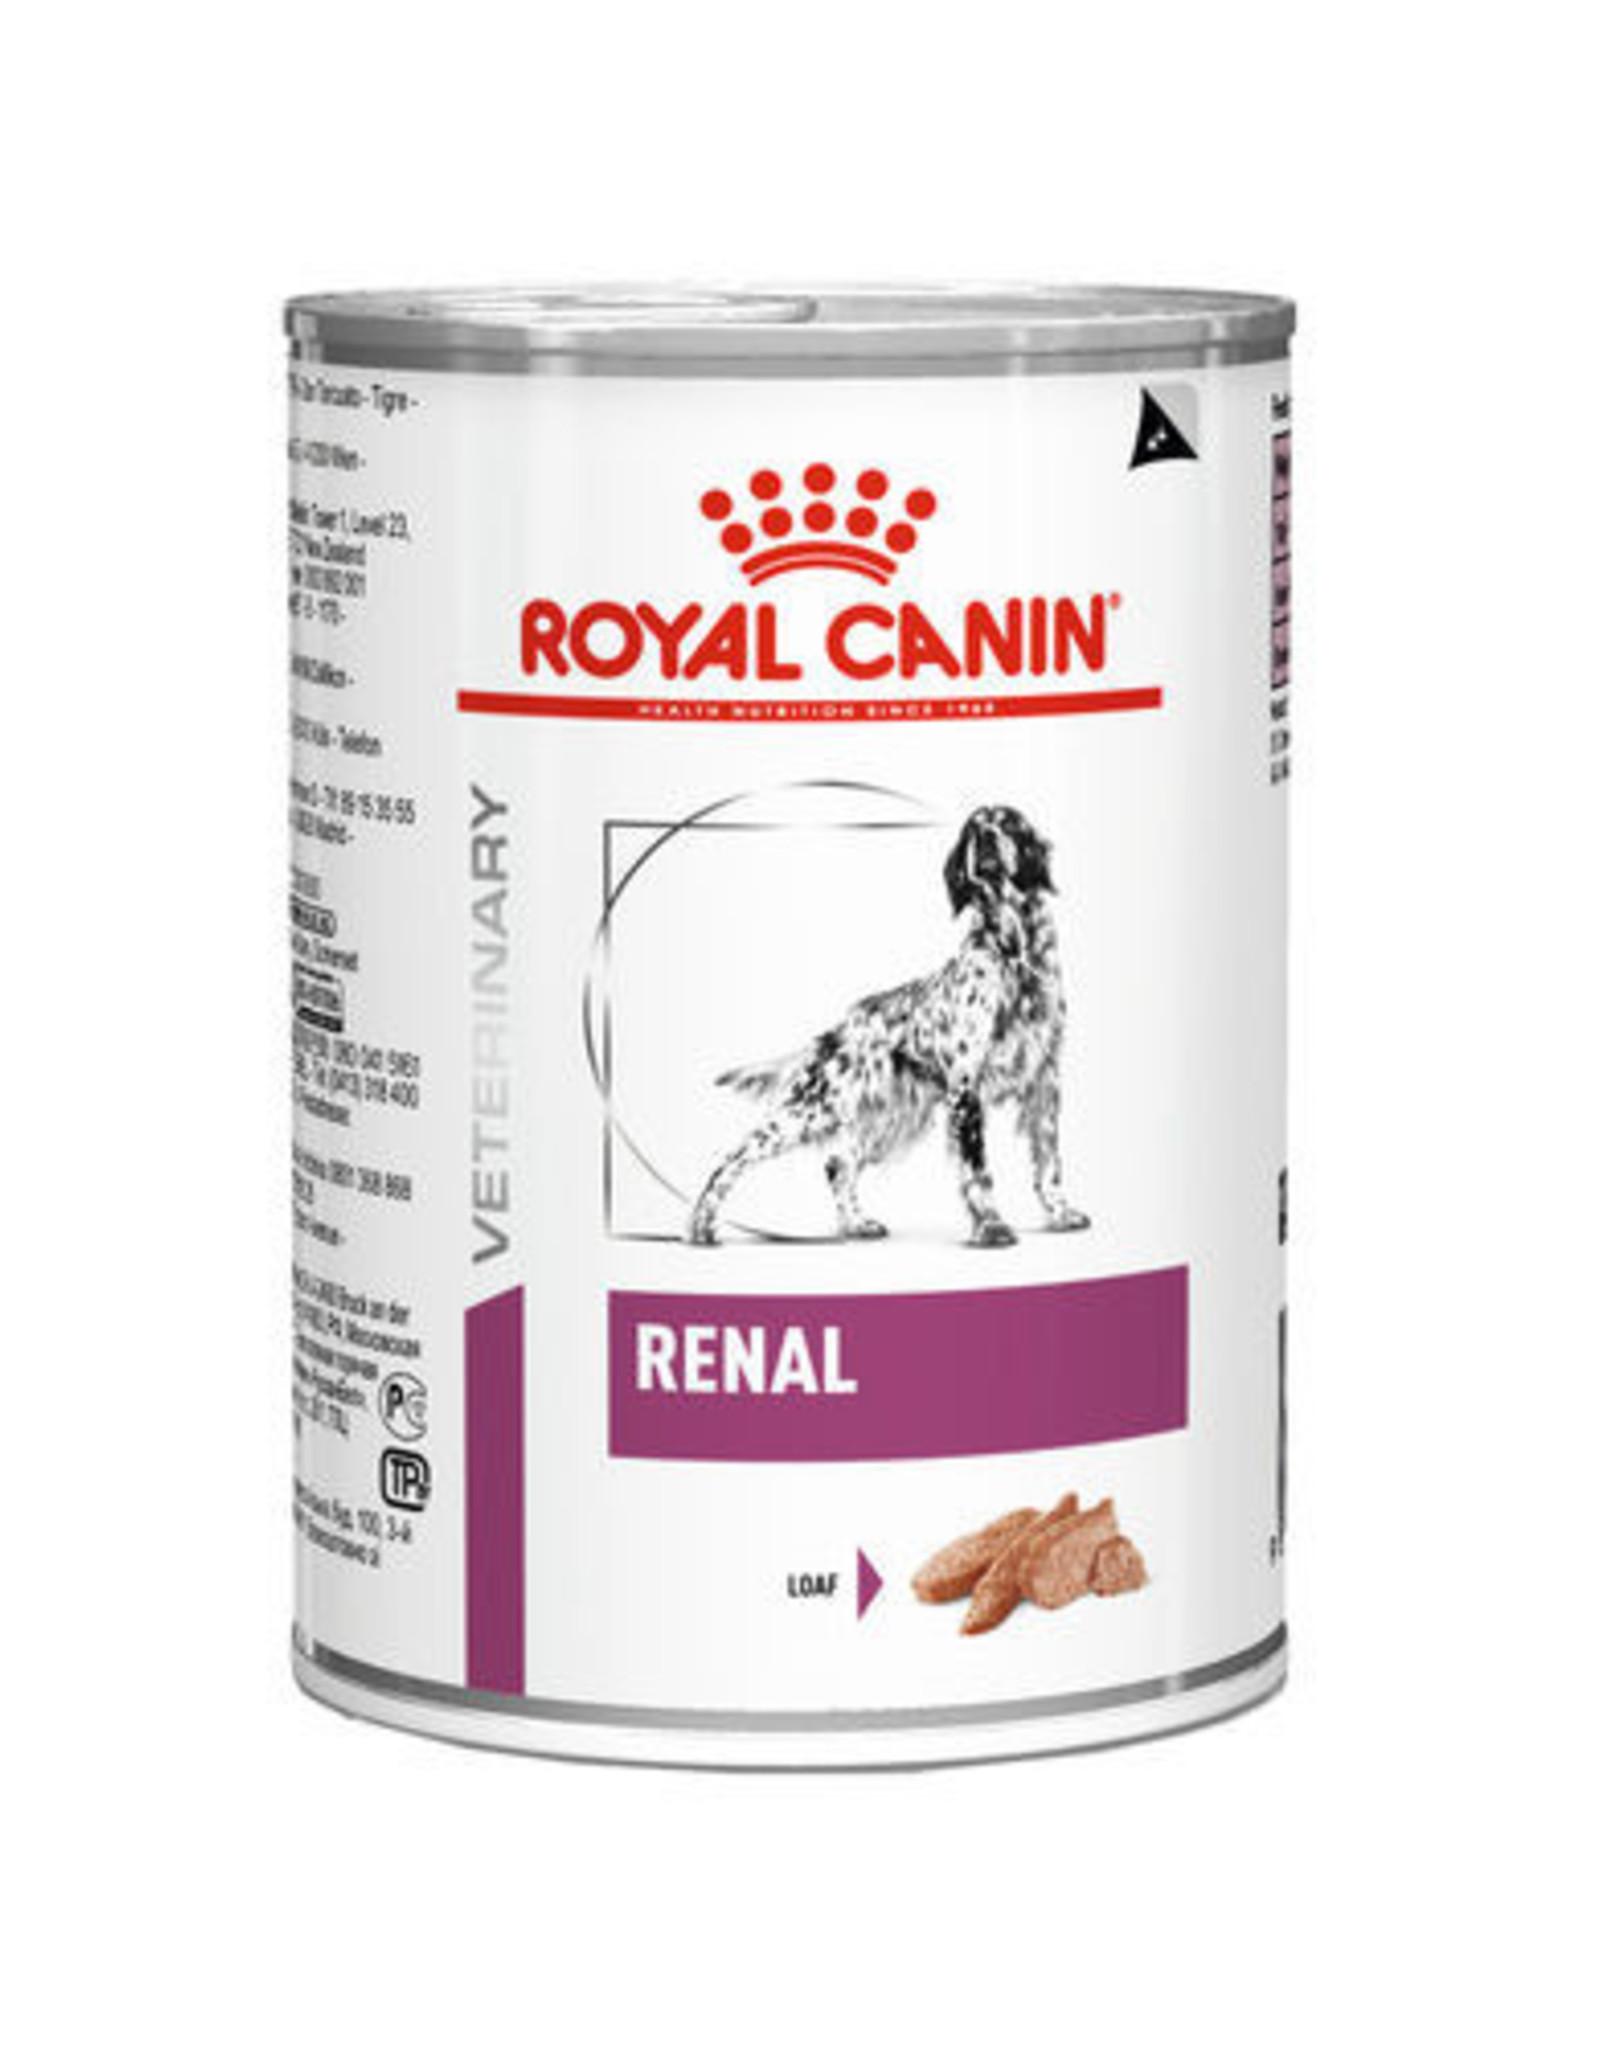 Royal Canin Royal Canin Vdiet Renal Hond 12x410g